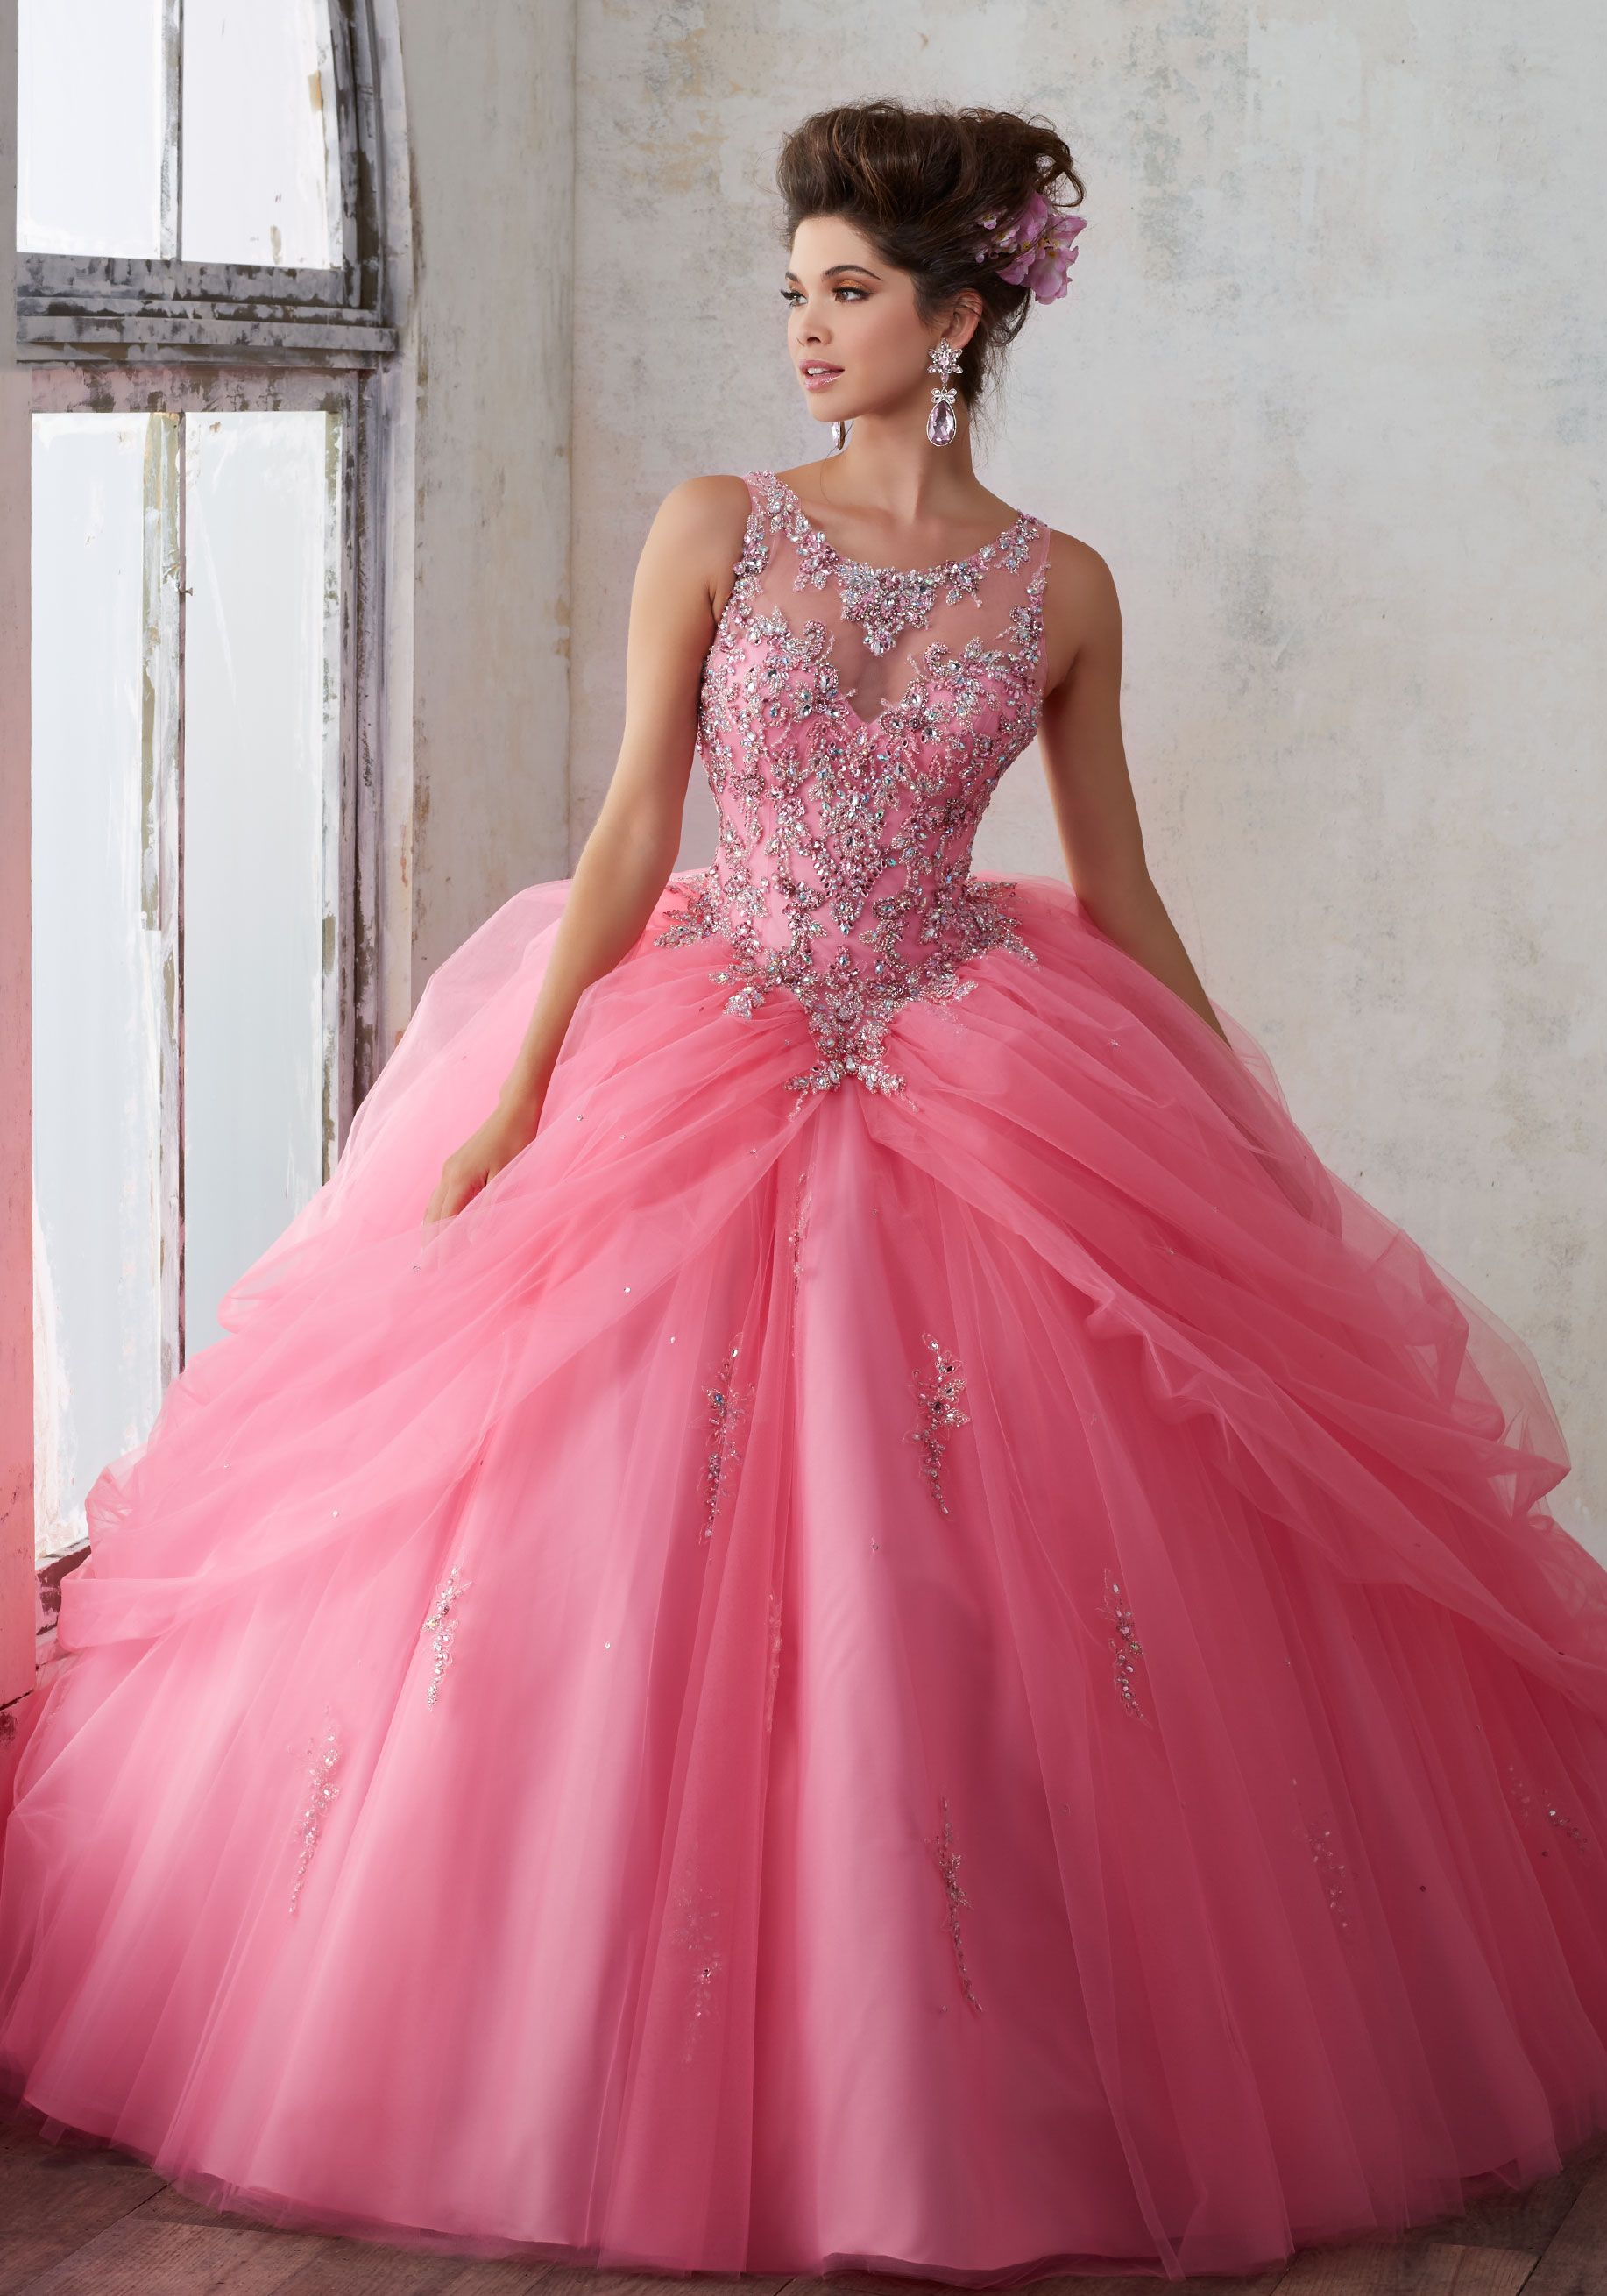 37bb5d2dfa0 Jeweled Beading on a Princess Tulle Ballgown